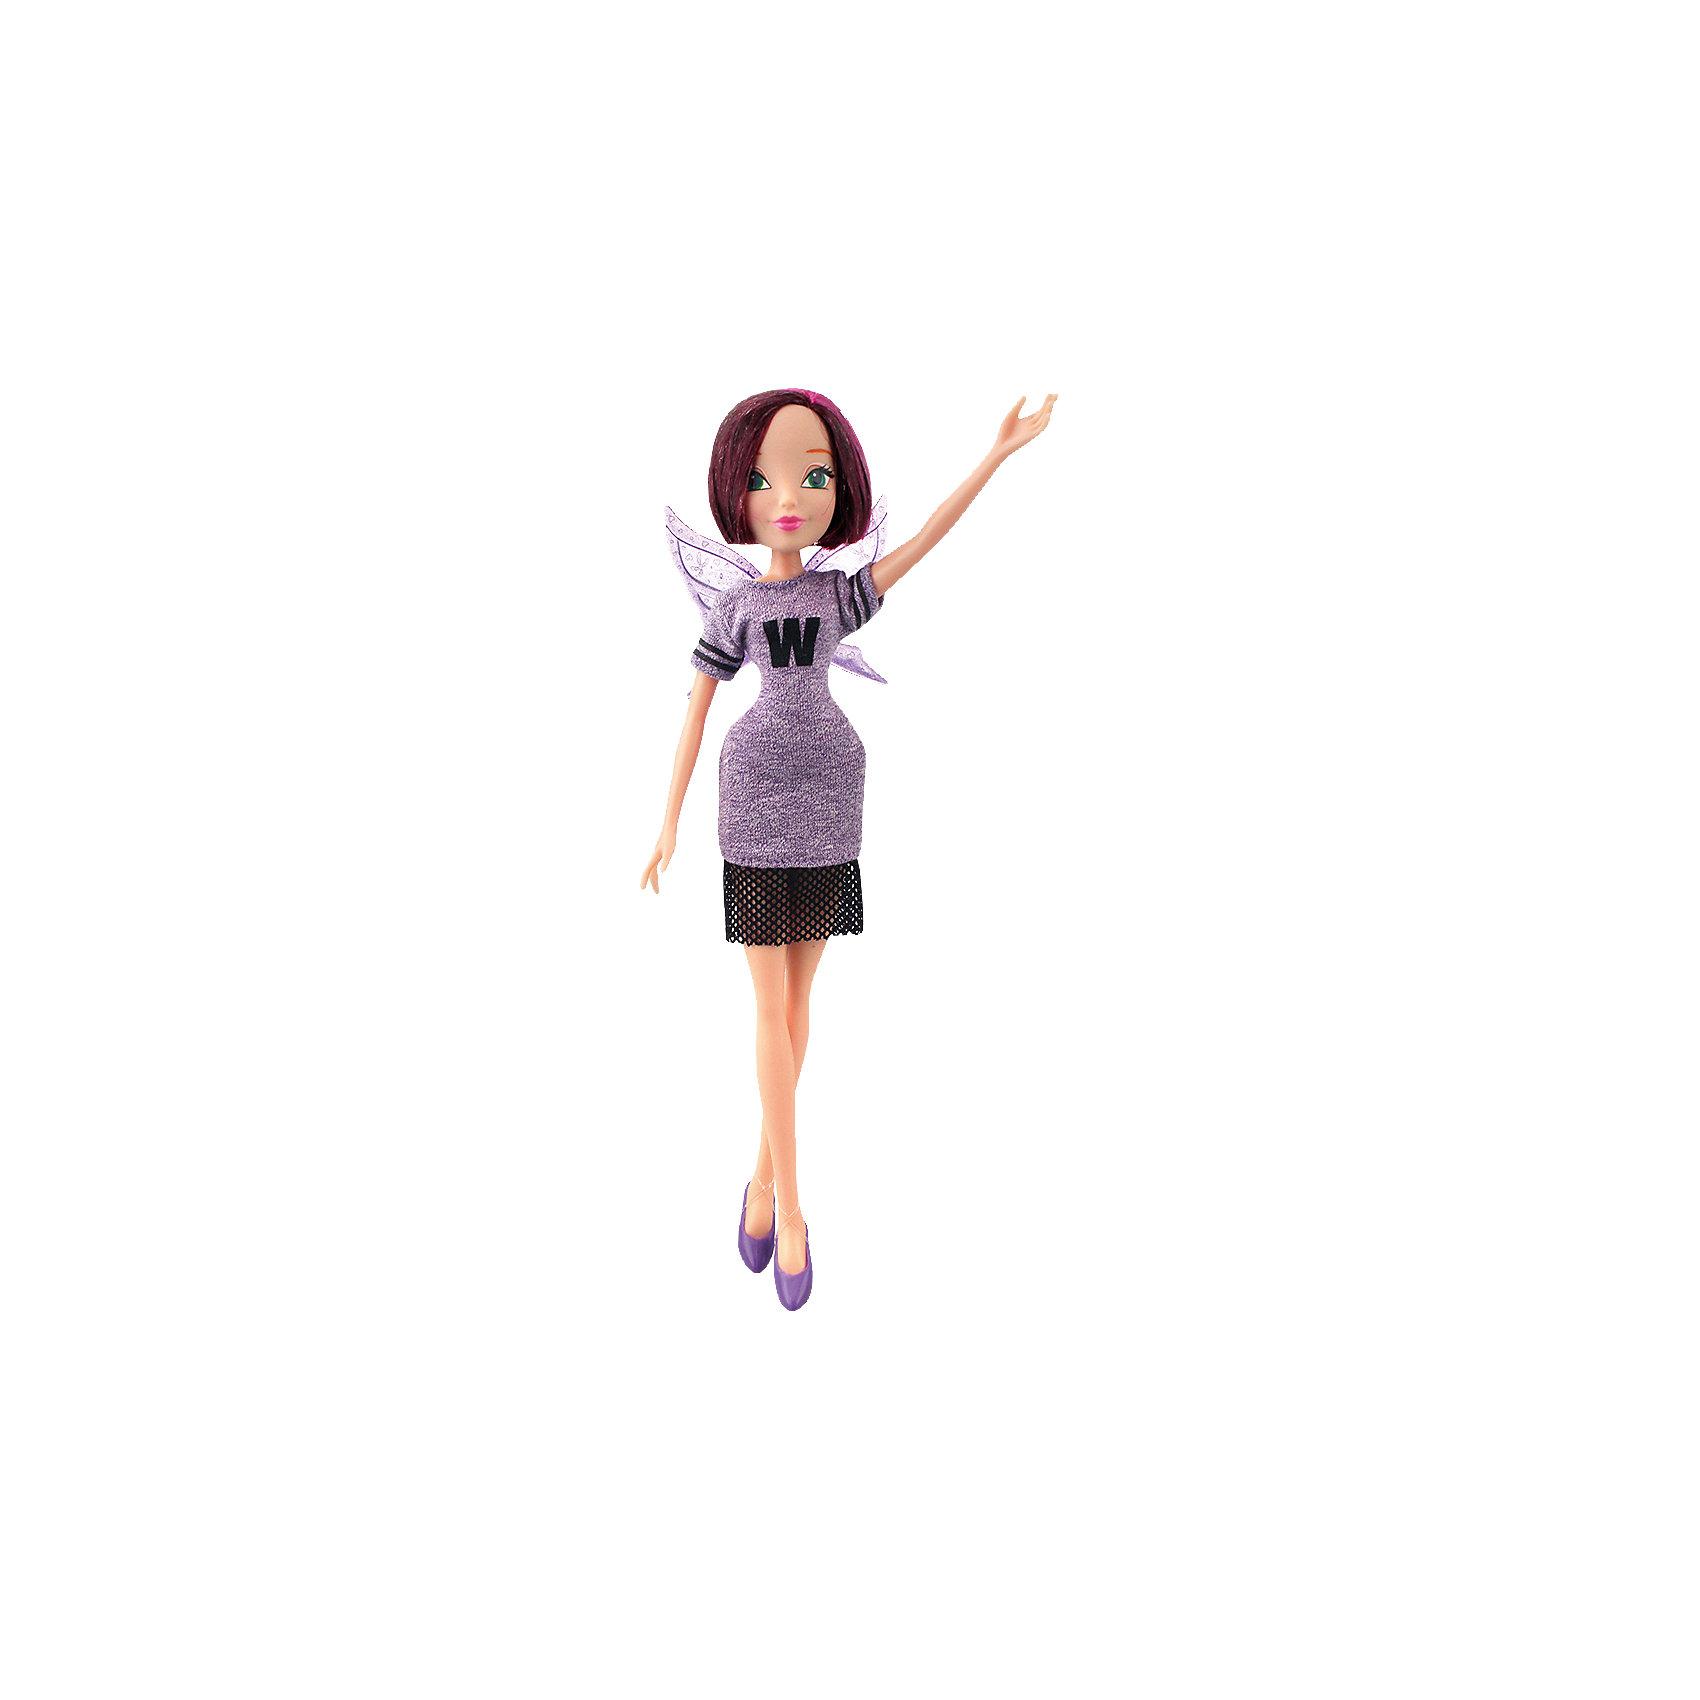 Кукла Текна Мода и магия-3, Winx ClubКуклы-модели<br>Doll Winx Club Fashion and magic 3, Tecna<br><br>Ширина мм: 200<br>Глубина мм: 250<br>Высота мм: 100<br>Вес г: 167<br>Возраст от месяцев: 36<br>Возраст до месяцев: 120<br>Пол: Женский<br>Возраст: Детский<br>SKU: 5532636